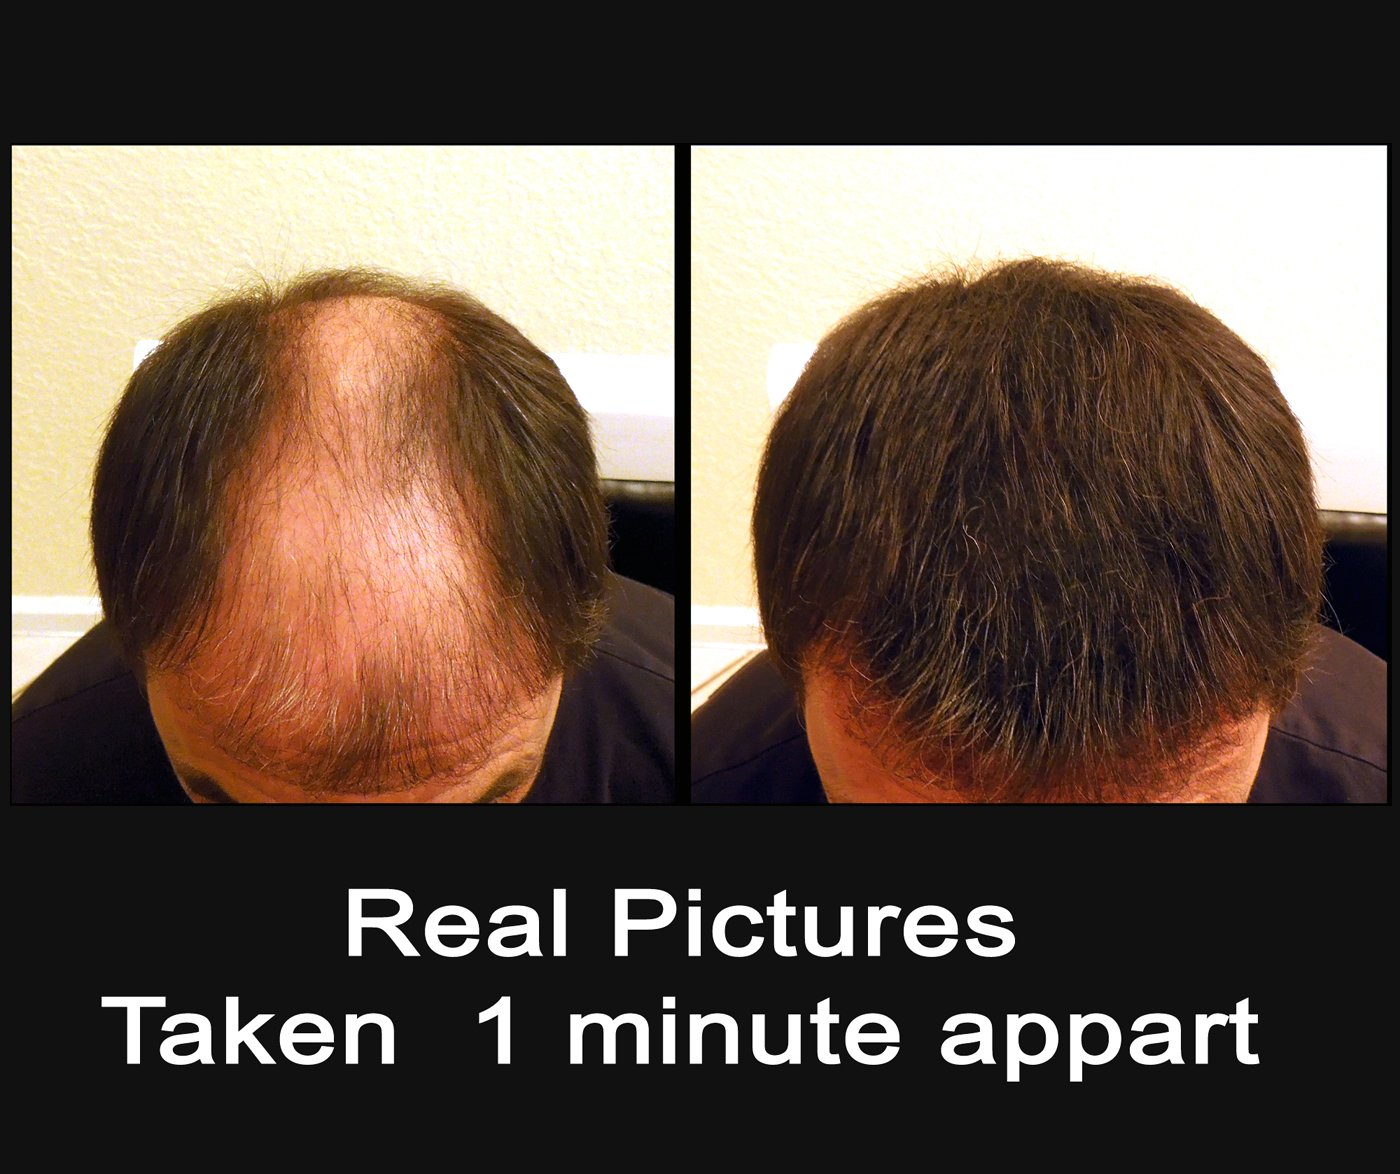 Samson Hair Building Fibers Hair Loss Concealer BLACK XL REFILL 100gr Made in USA Available Worldwide by SamsonHair